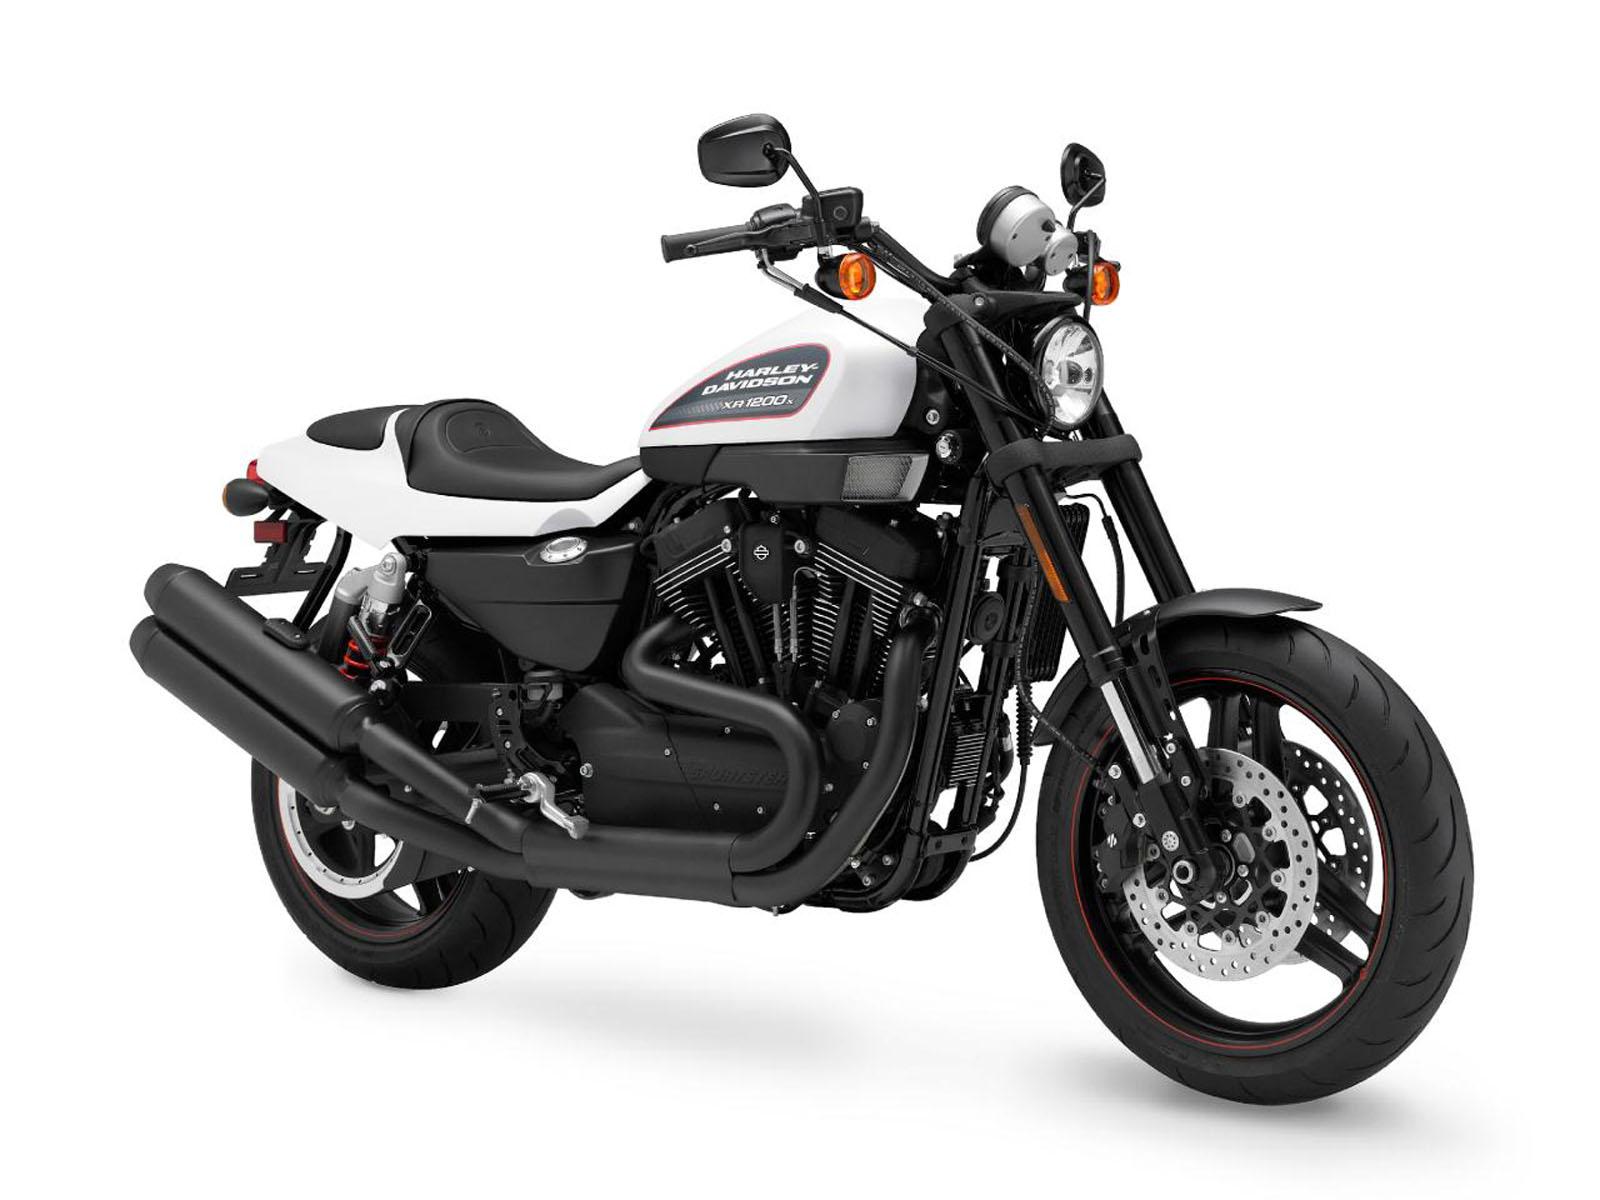 wallpaper Harley Davidson Bikes Wallpapers 1600x1200